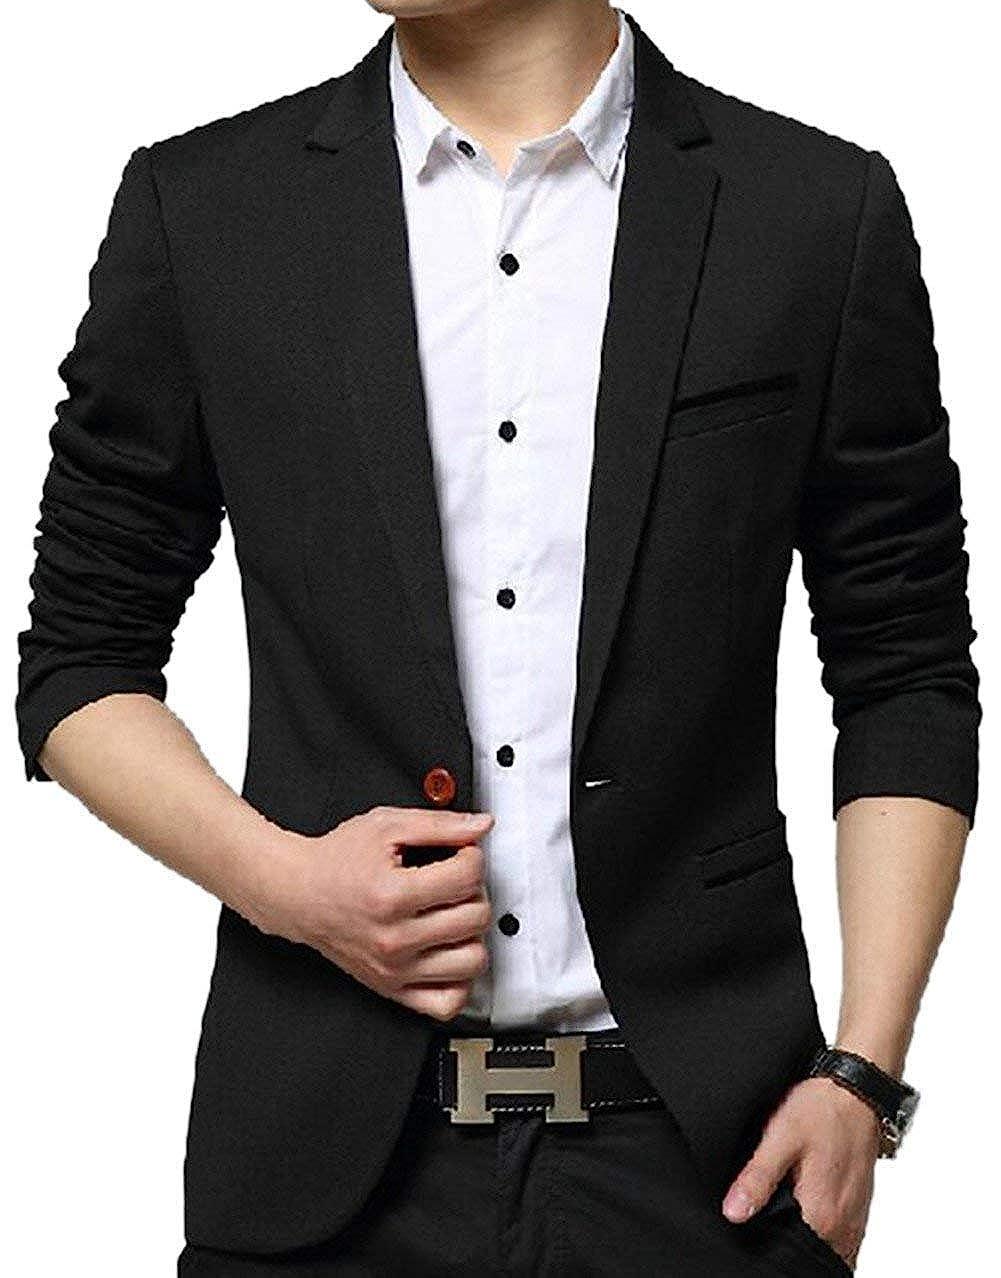 HX fashion Mens Blazer Slim Fit Leisure Blazer Casual Men Nner Comfortable Sizes Business Wedding Party Suit Business Mens Blazer 1 Button Jacket Clothing